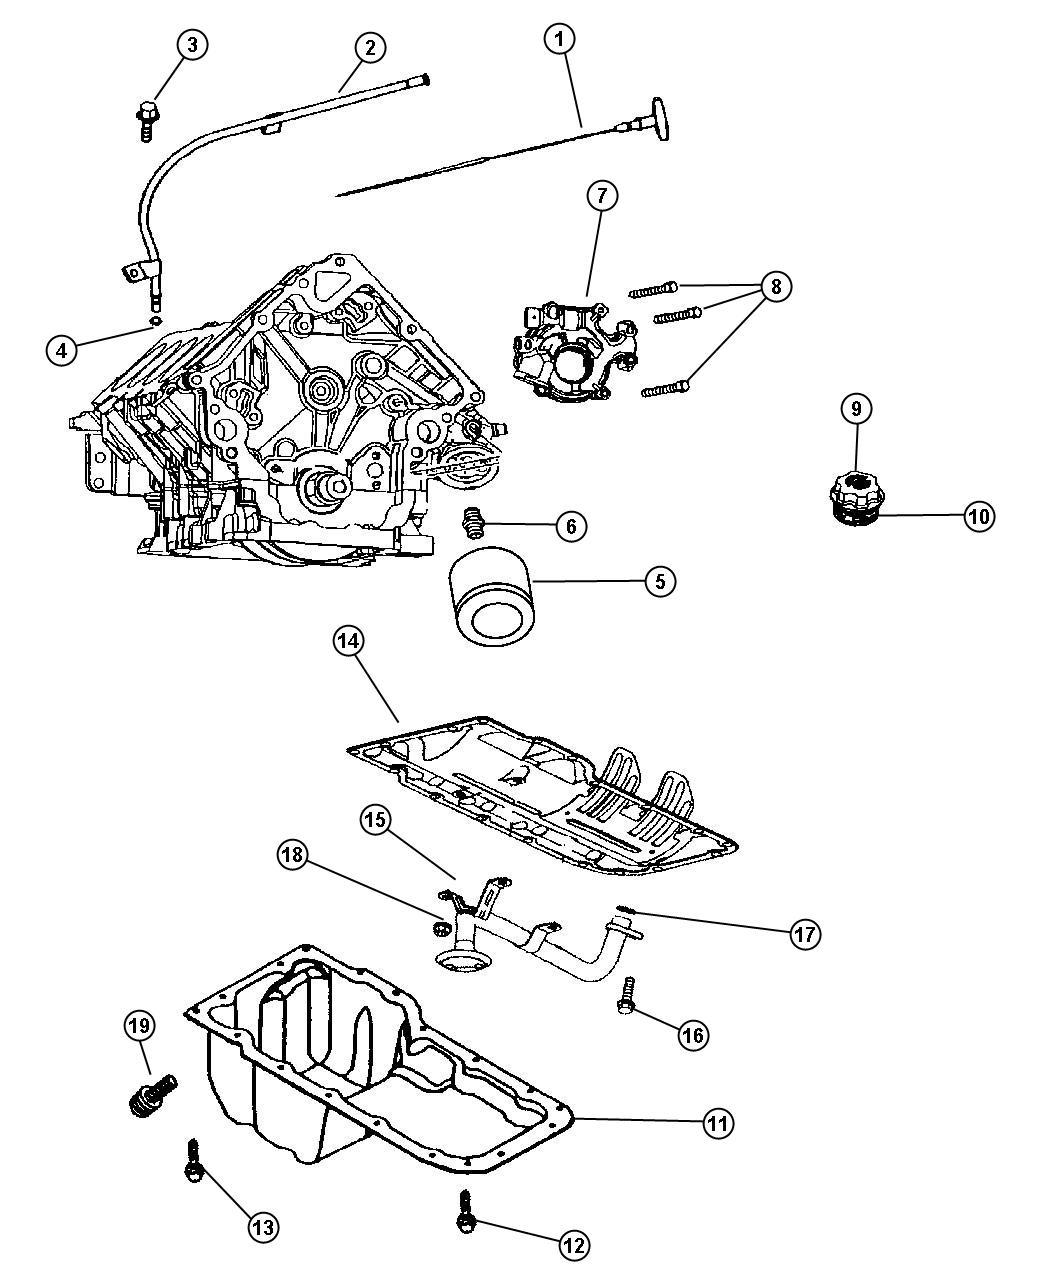 i2176784  Hemi Engine Diagram Coolant on dodge durango, cubic inches, pics 06 charger, dress up kits, firing order, chrysler 300c, rebuild kit, spark plugs, timing marks,